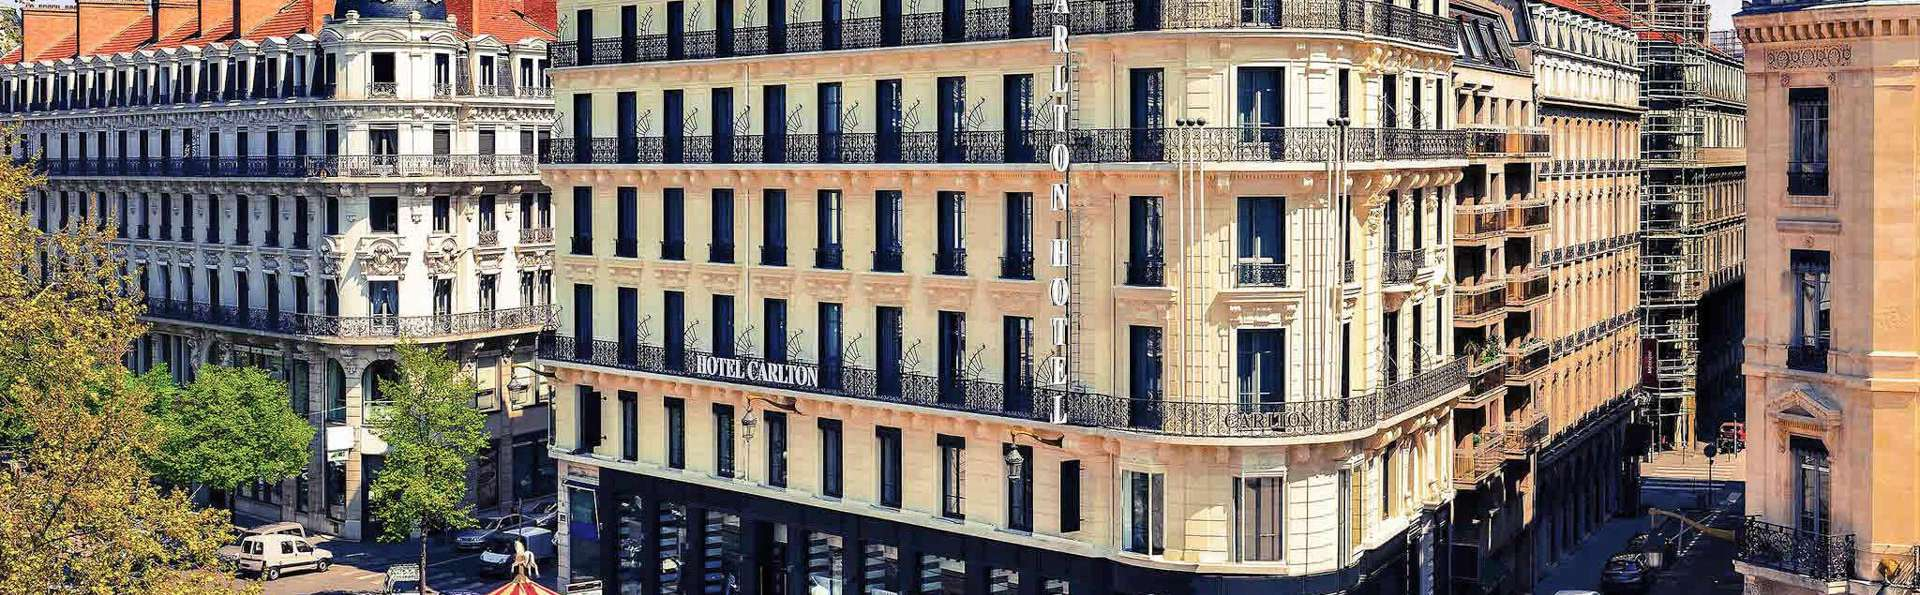 Hotel Carlton Lyon - EDIT_FRONT_01.jpg